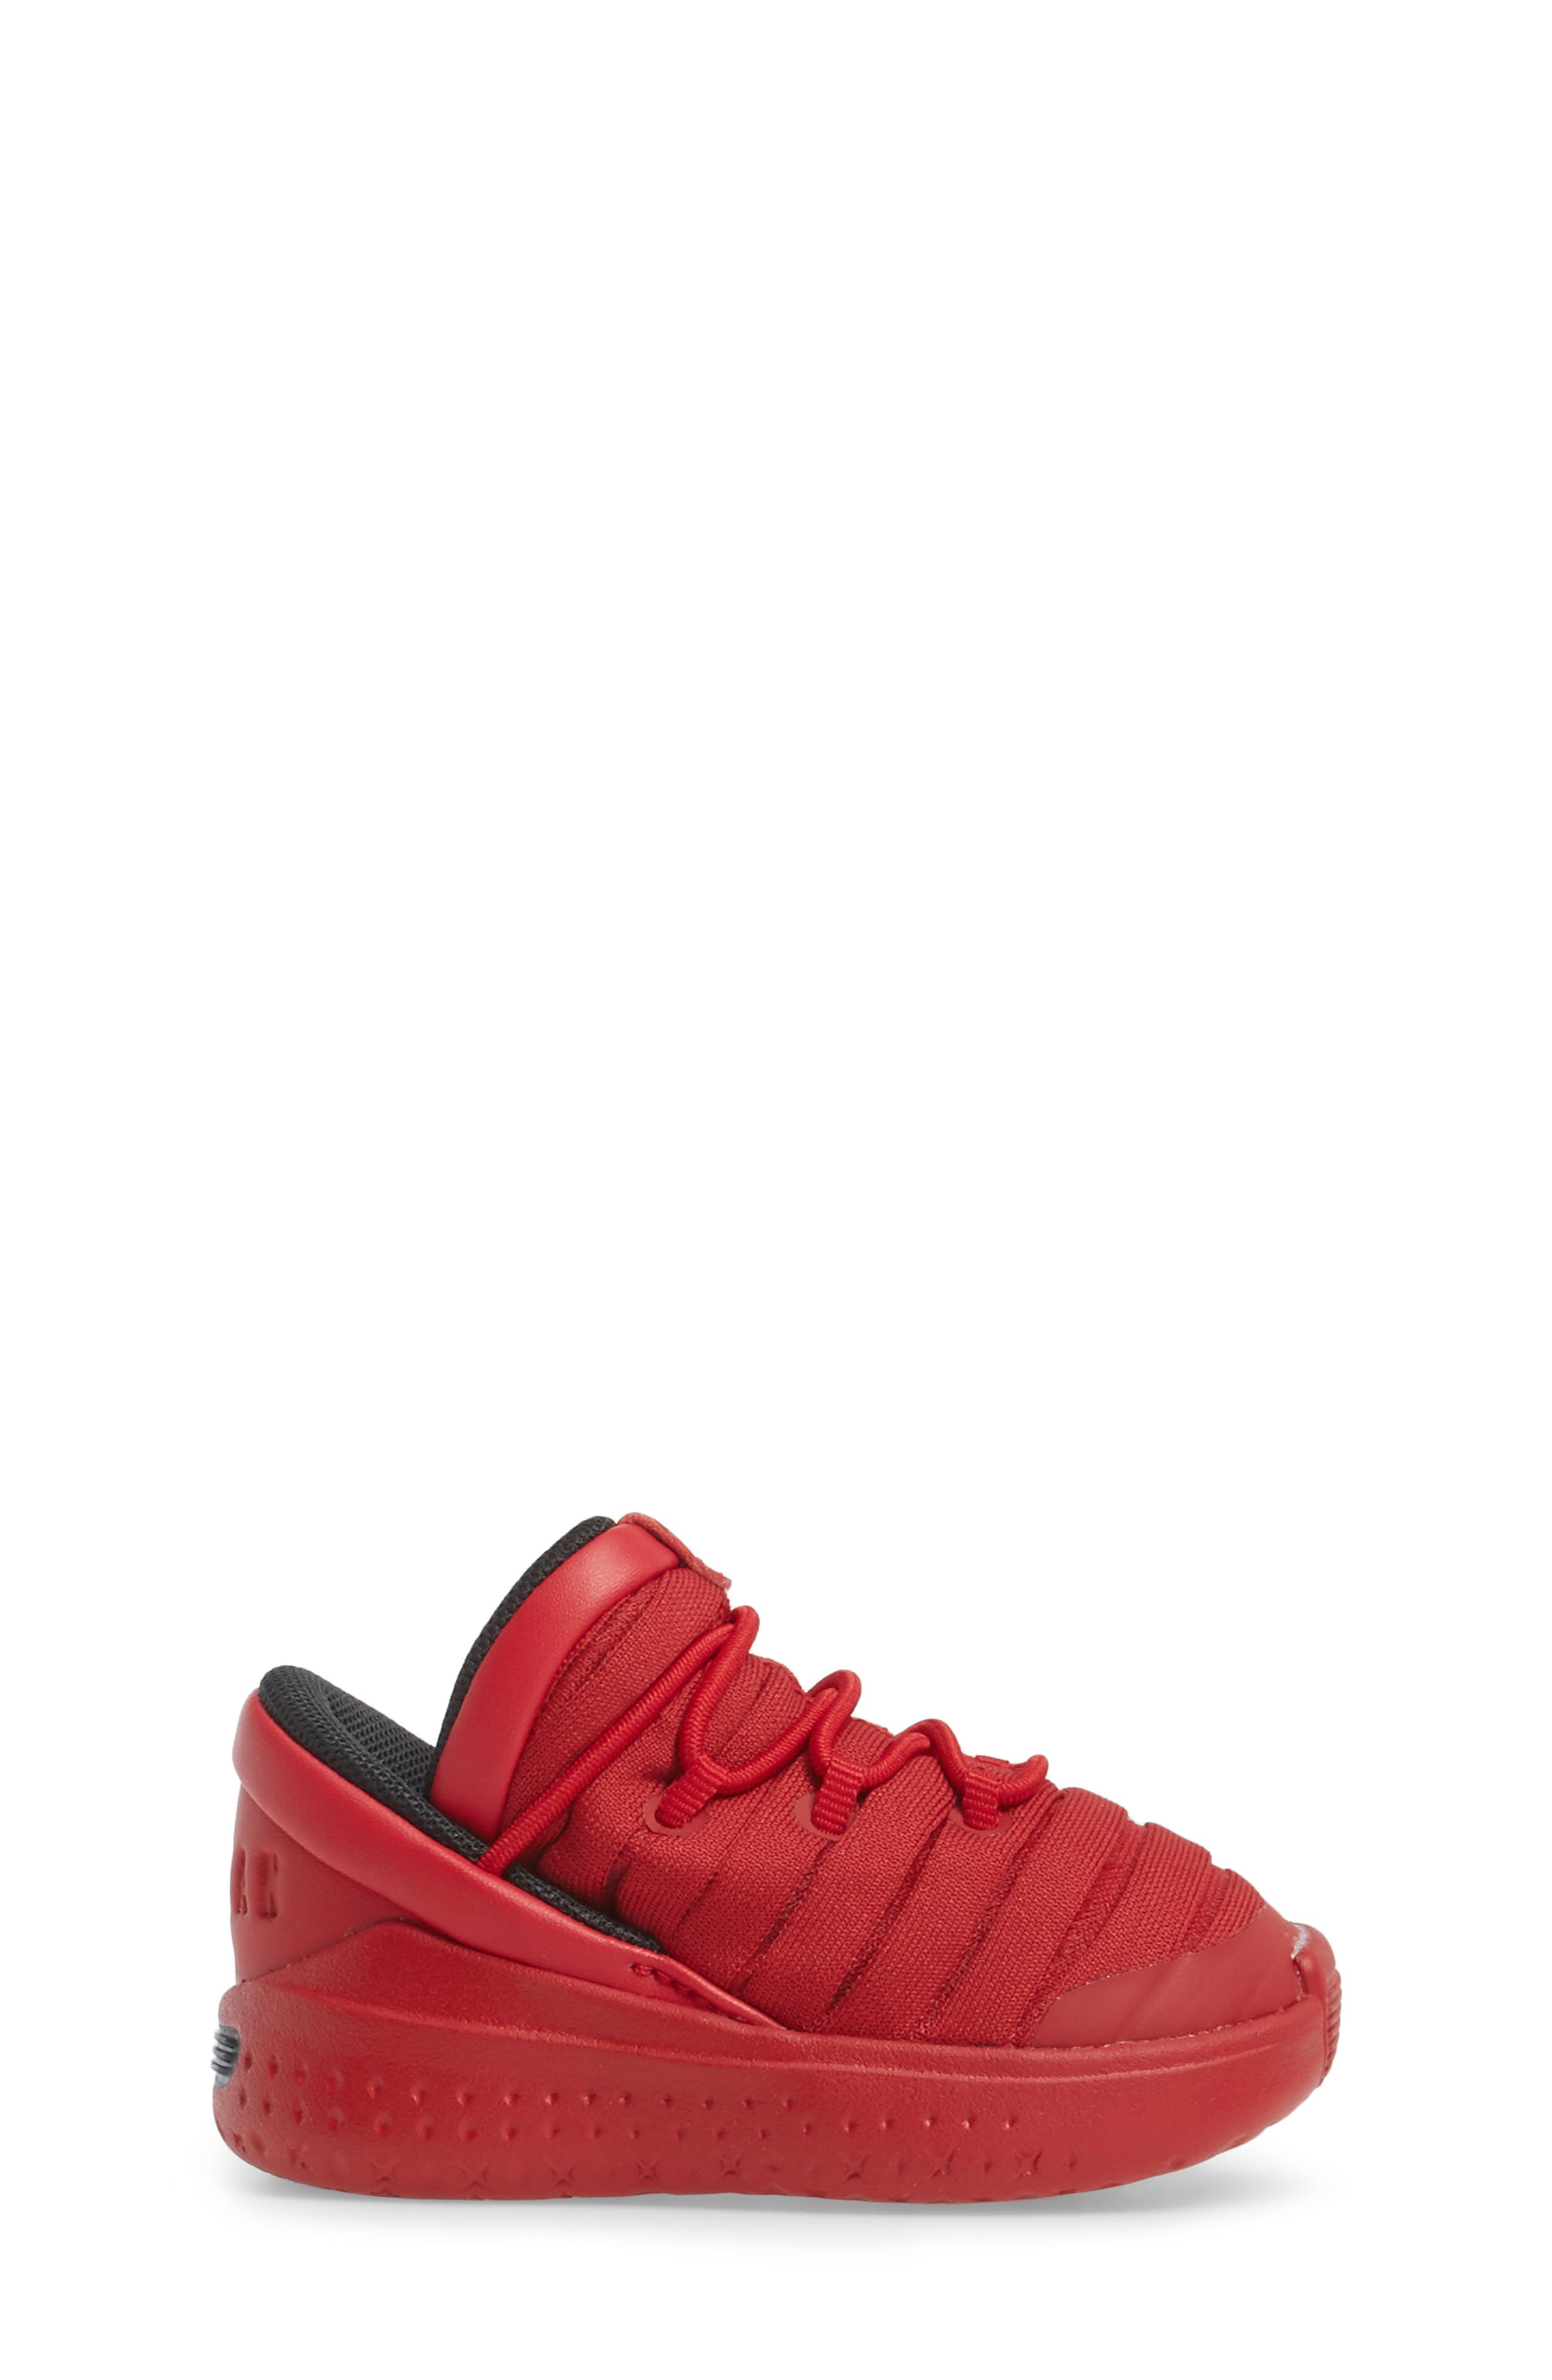 Flight Luxe Sneaker,                             Alternate thumbnail 6, color,